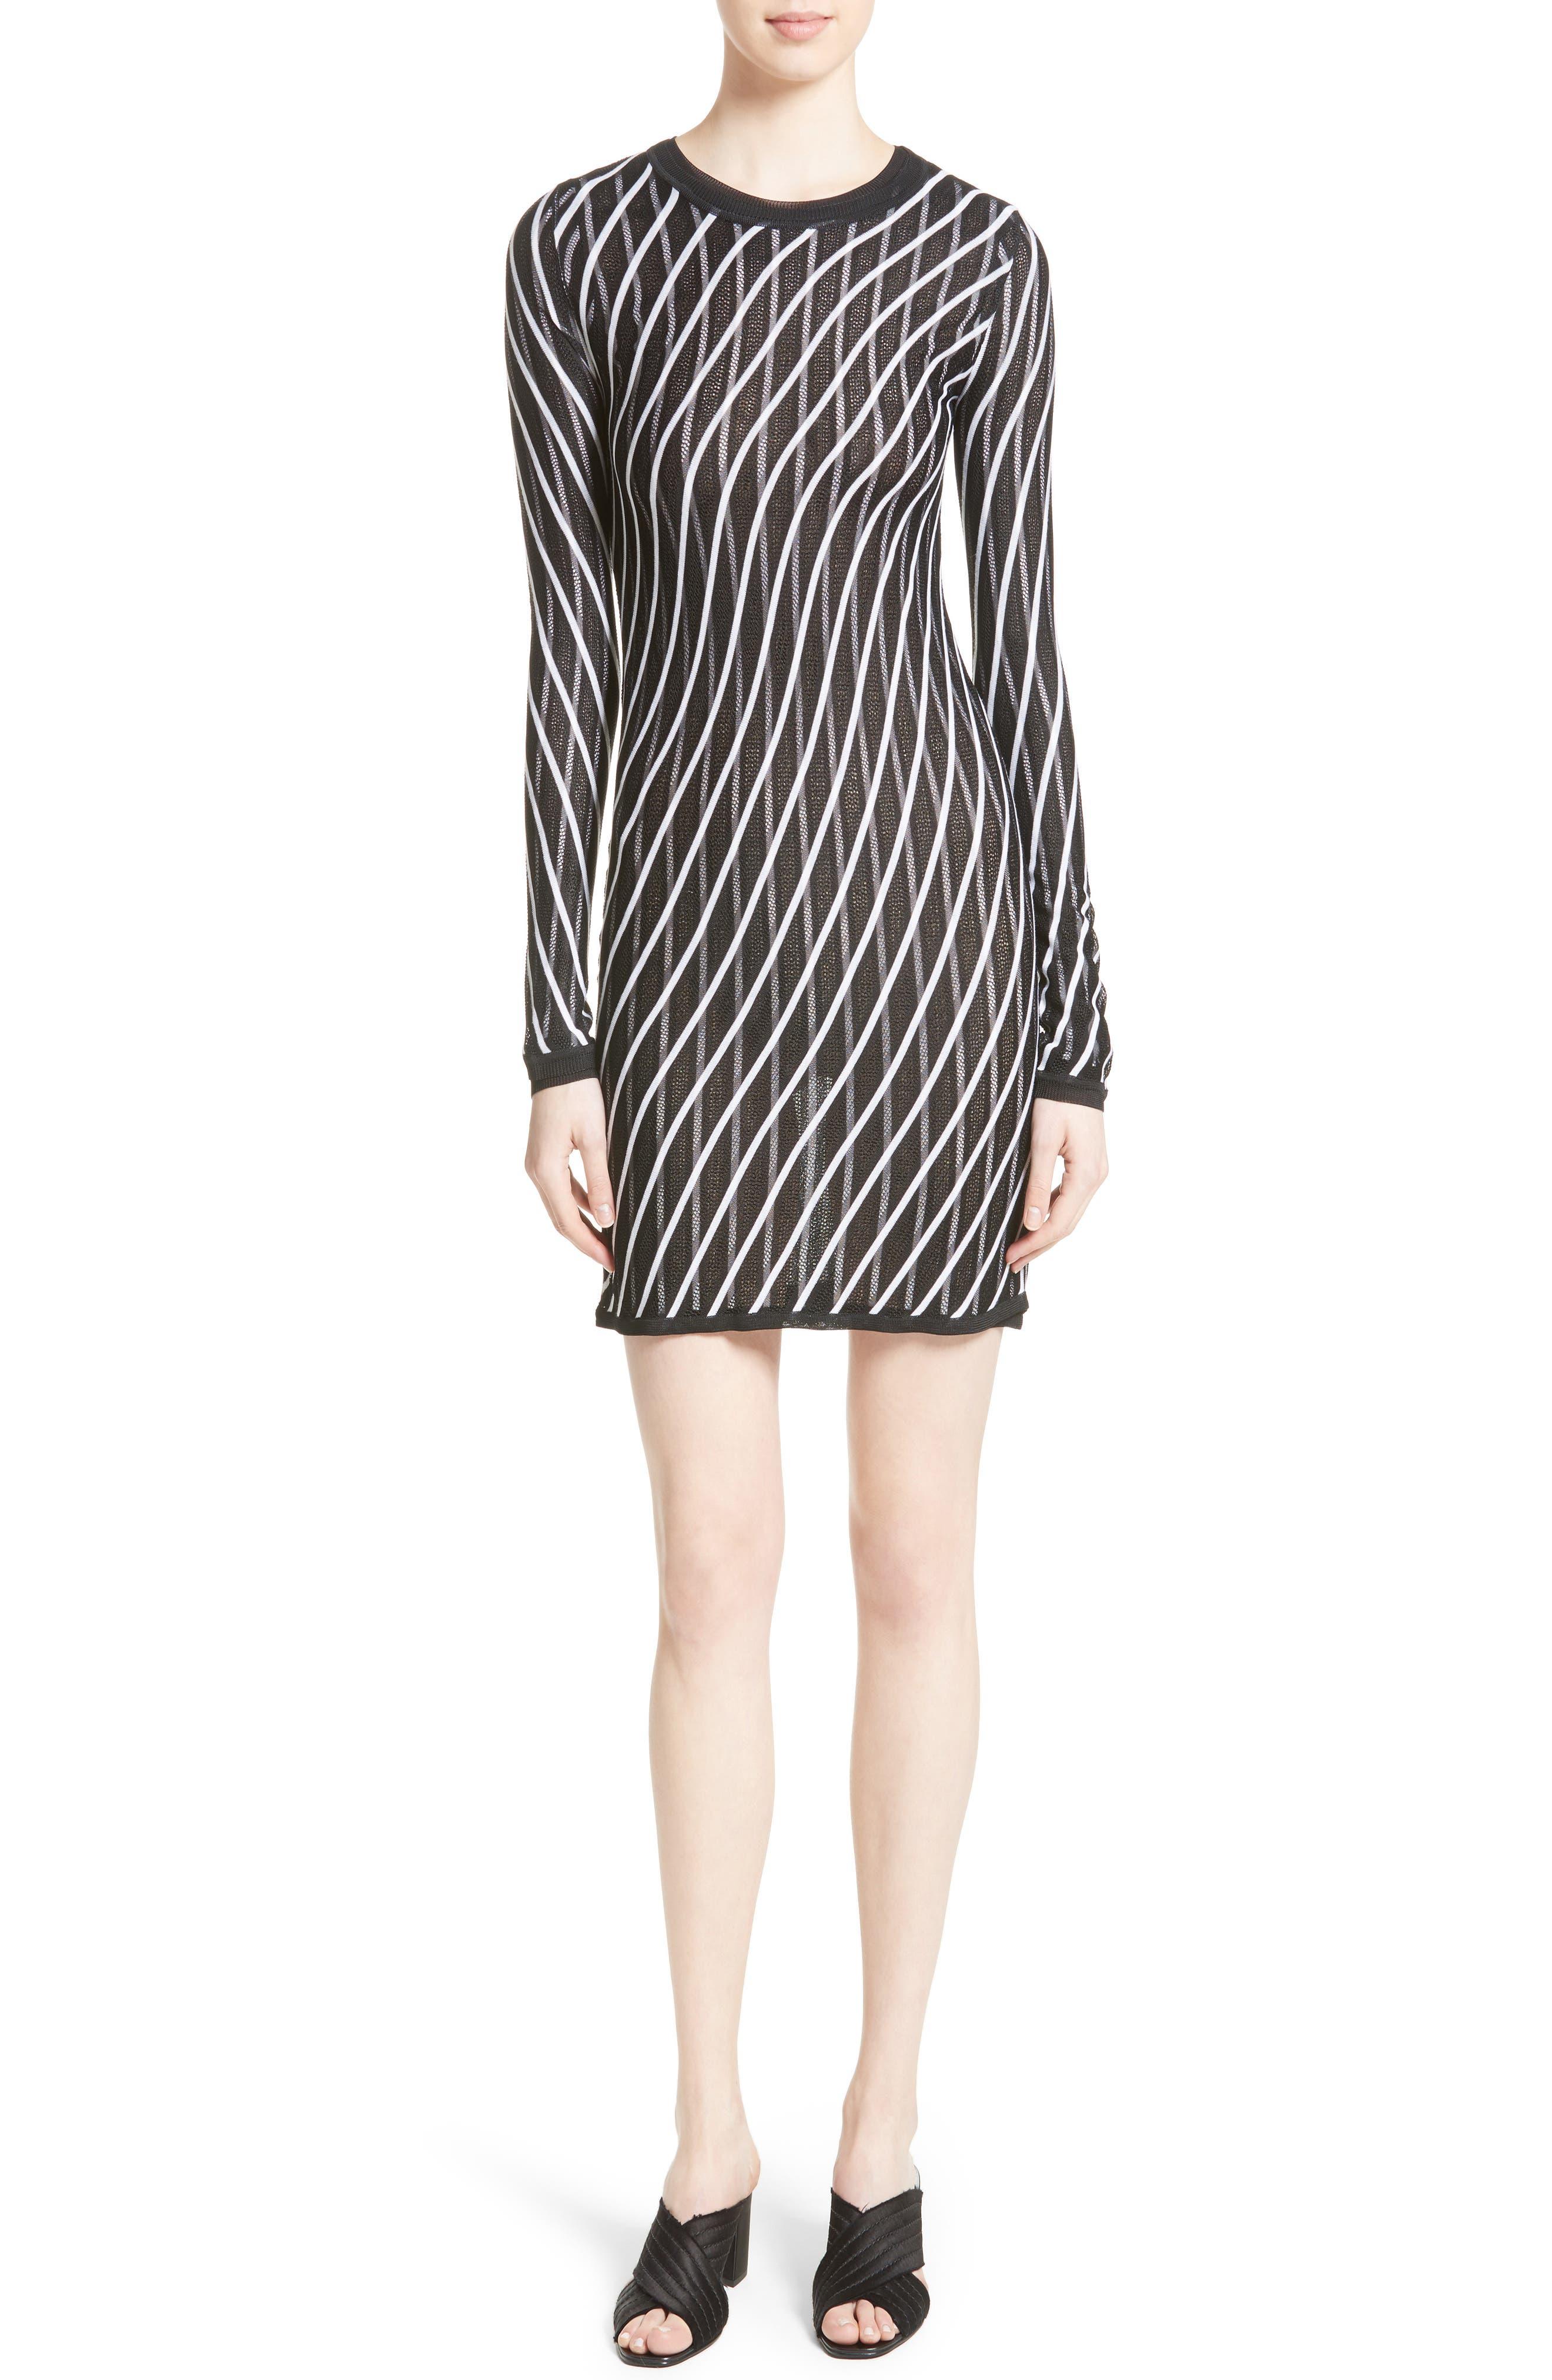 Alternate Image 1 Selected - Diane von Furstenberg Double Layer Stripe Sweater Dress